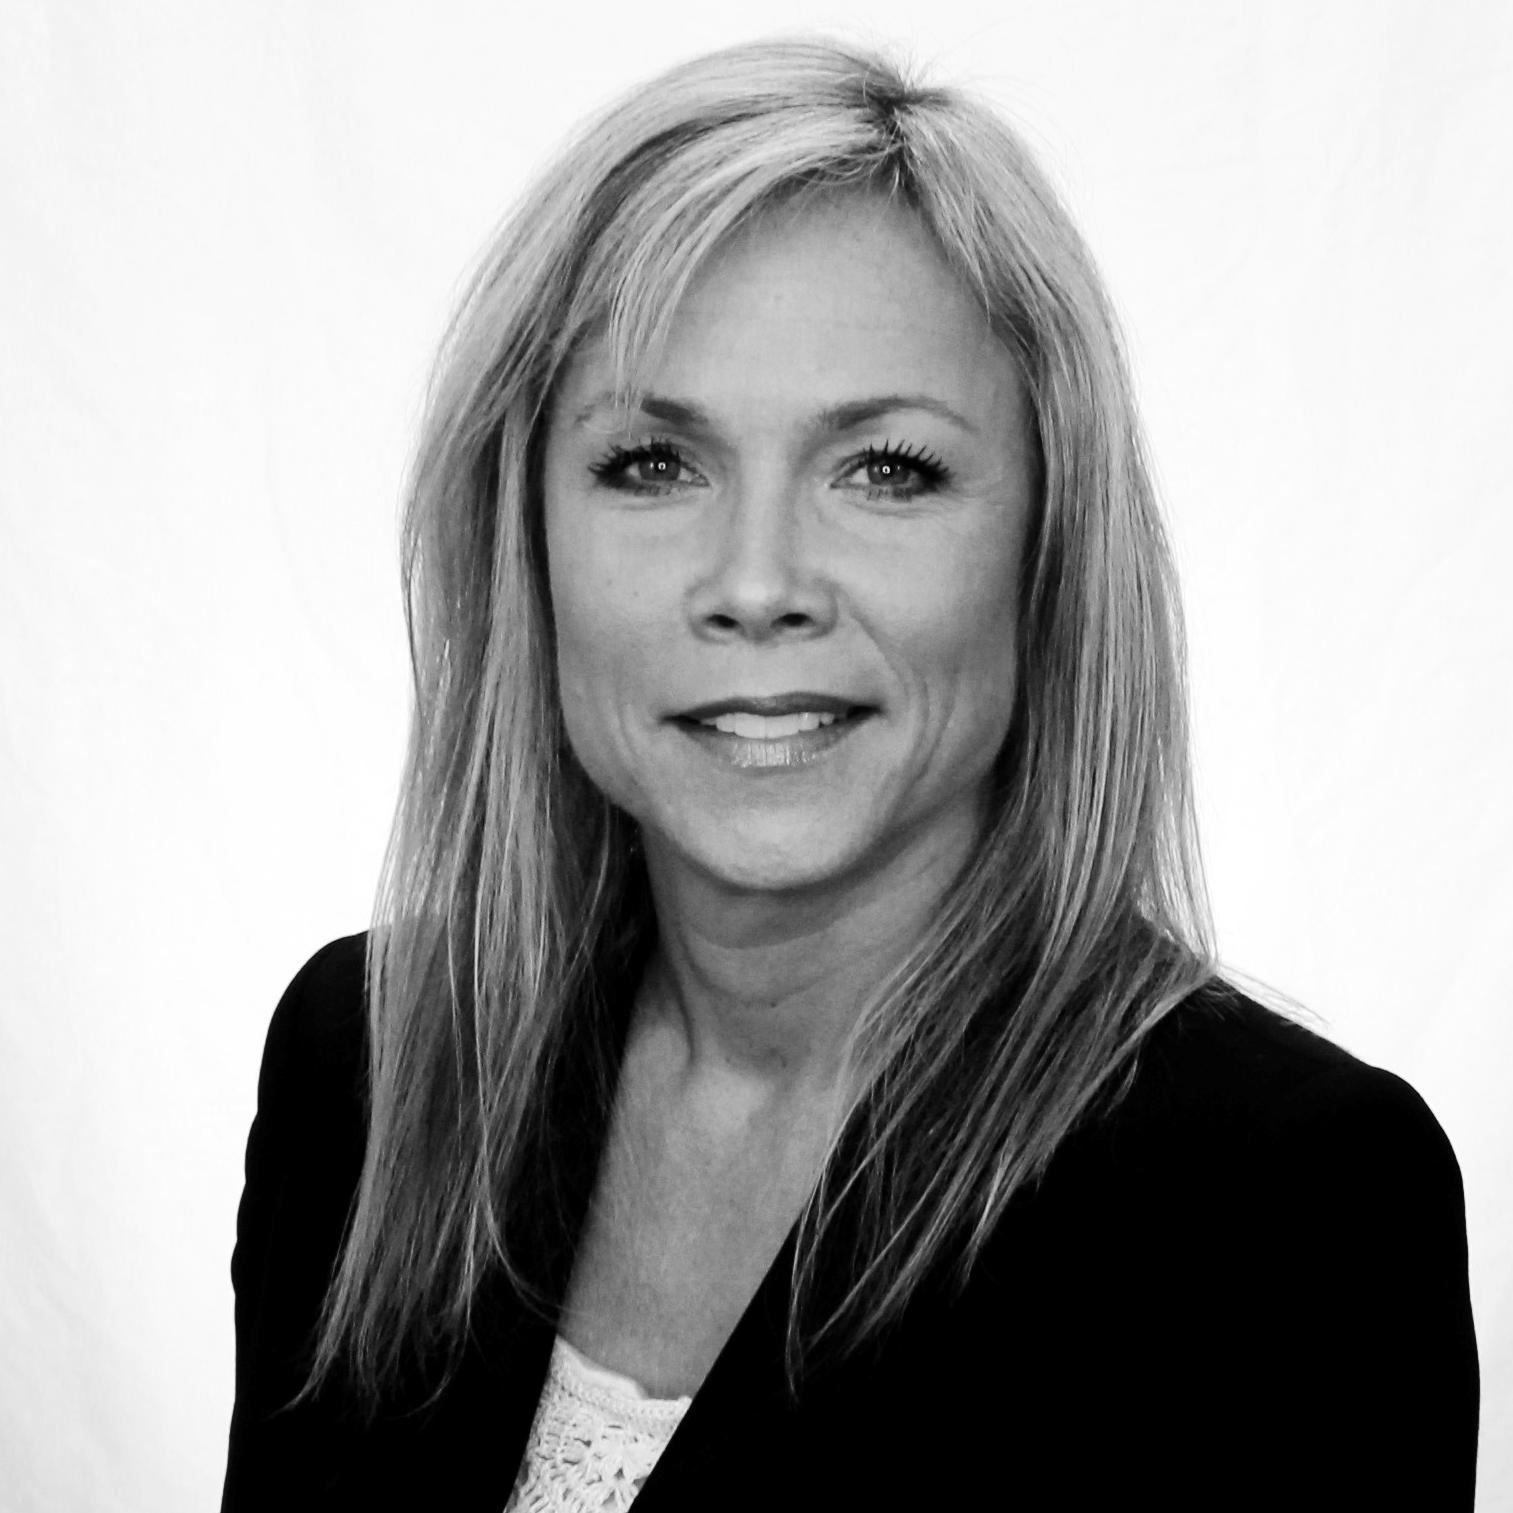 Christine Plunkett